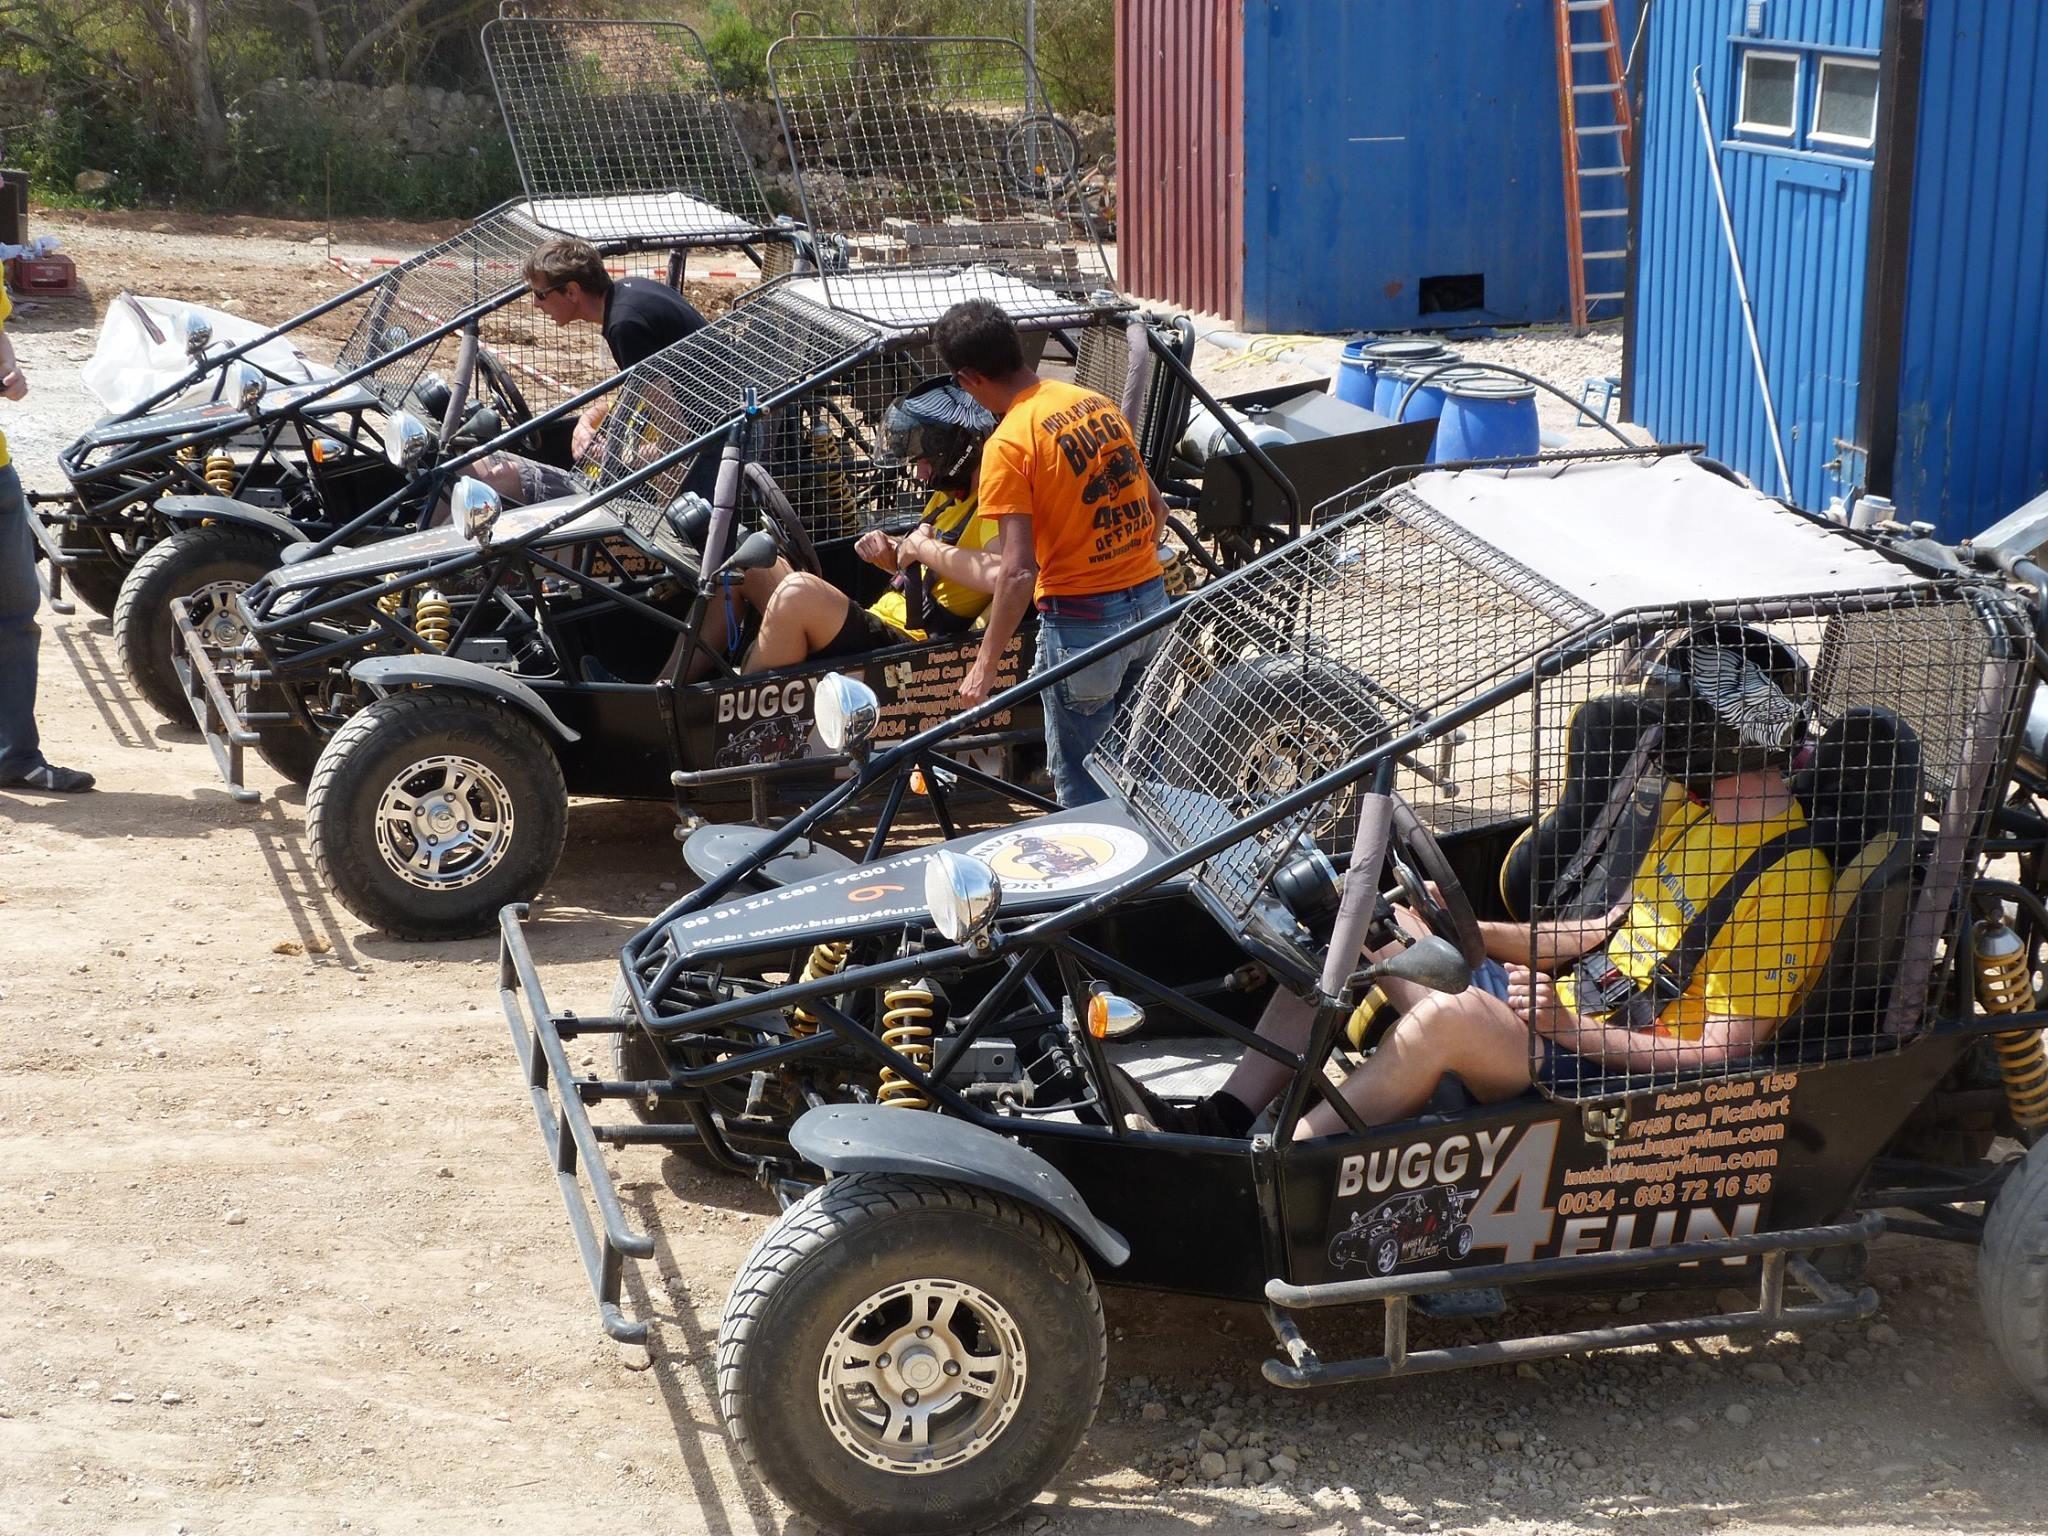 Splinternye Bildet : bil, jeep, motor, mallorca, offroad, skrap LC-18